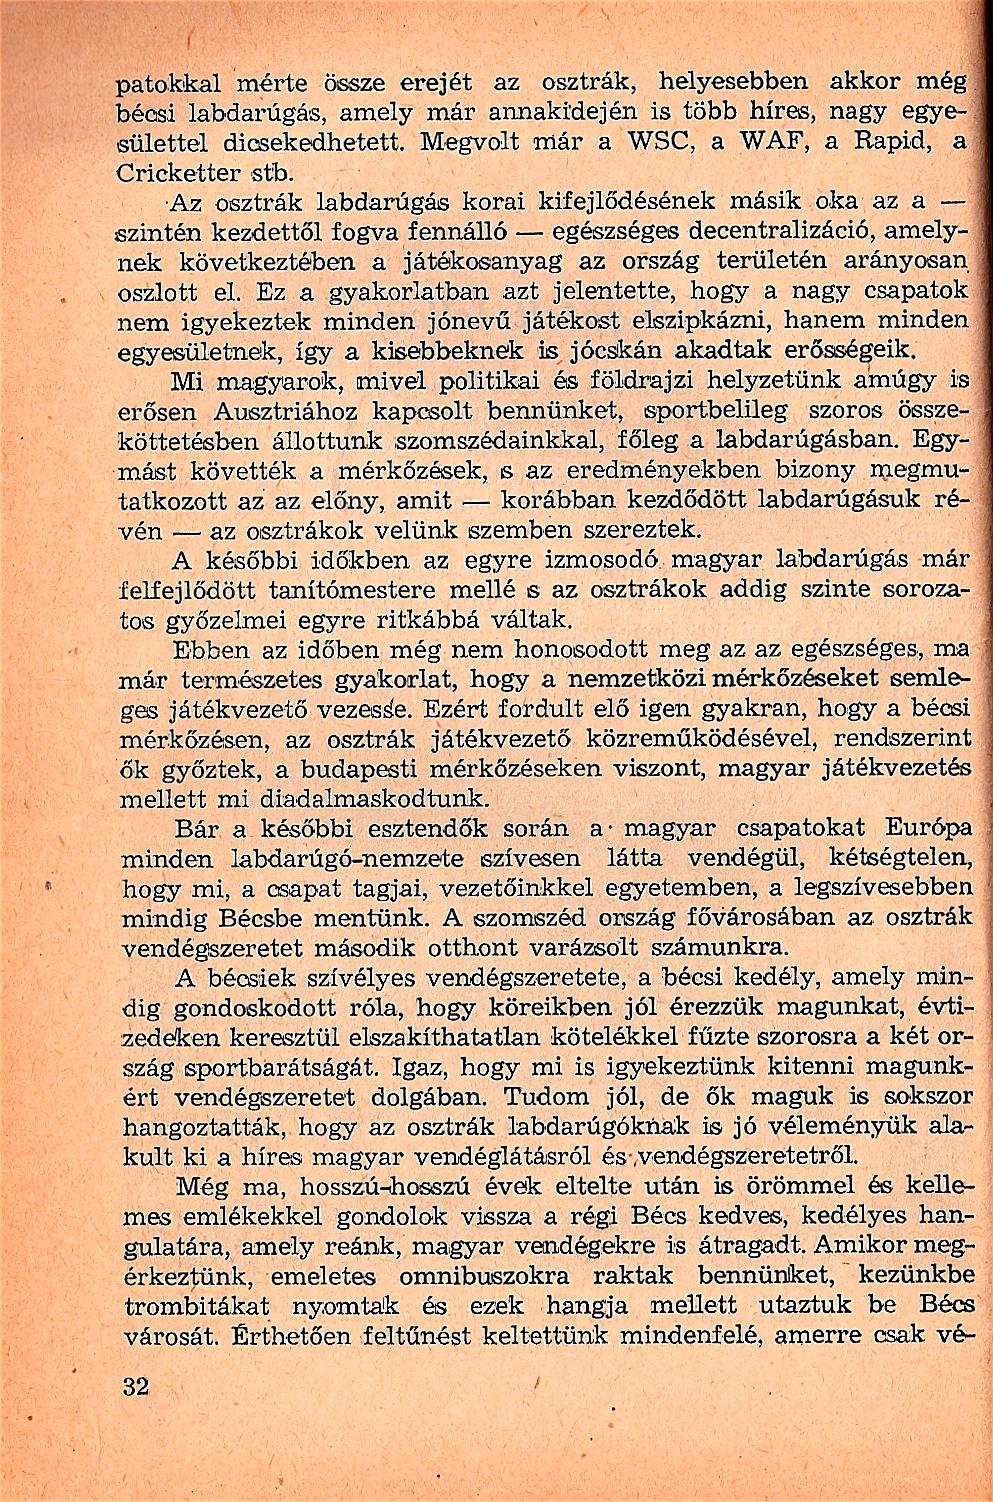 schlosser_fel-evszazad_1957_32_1102